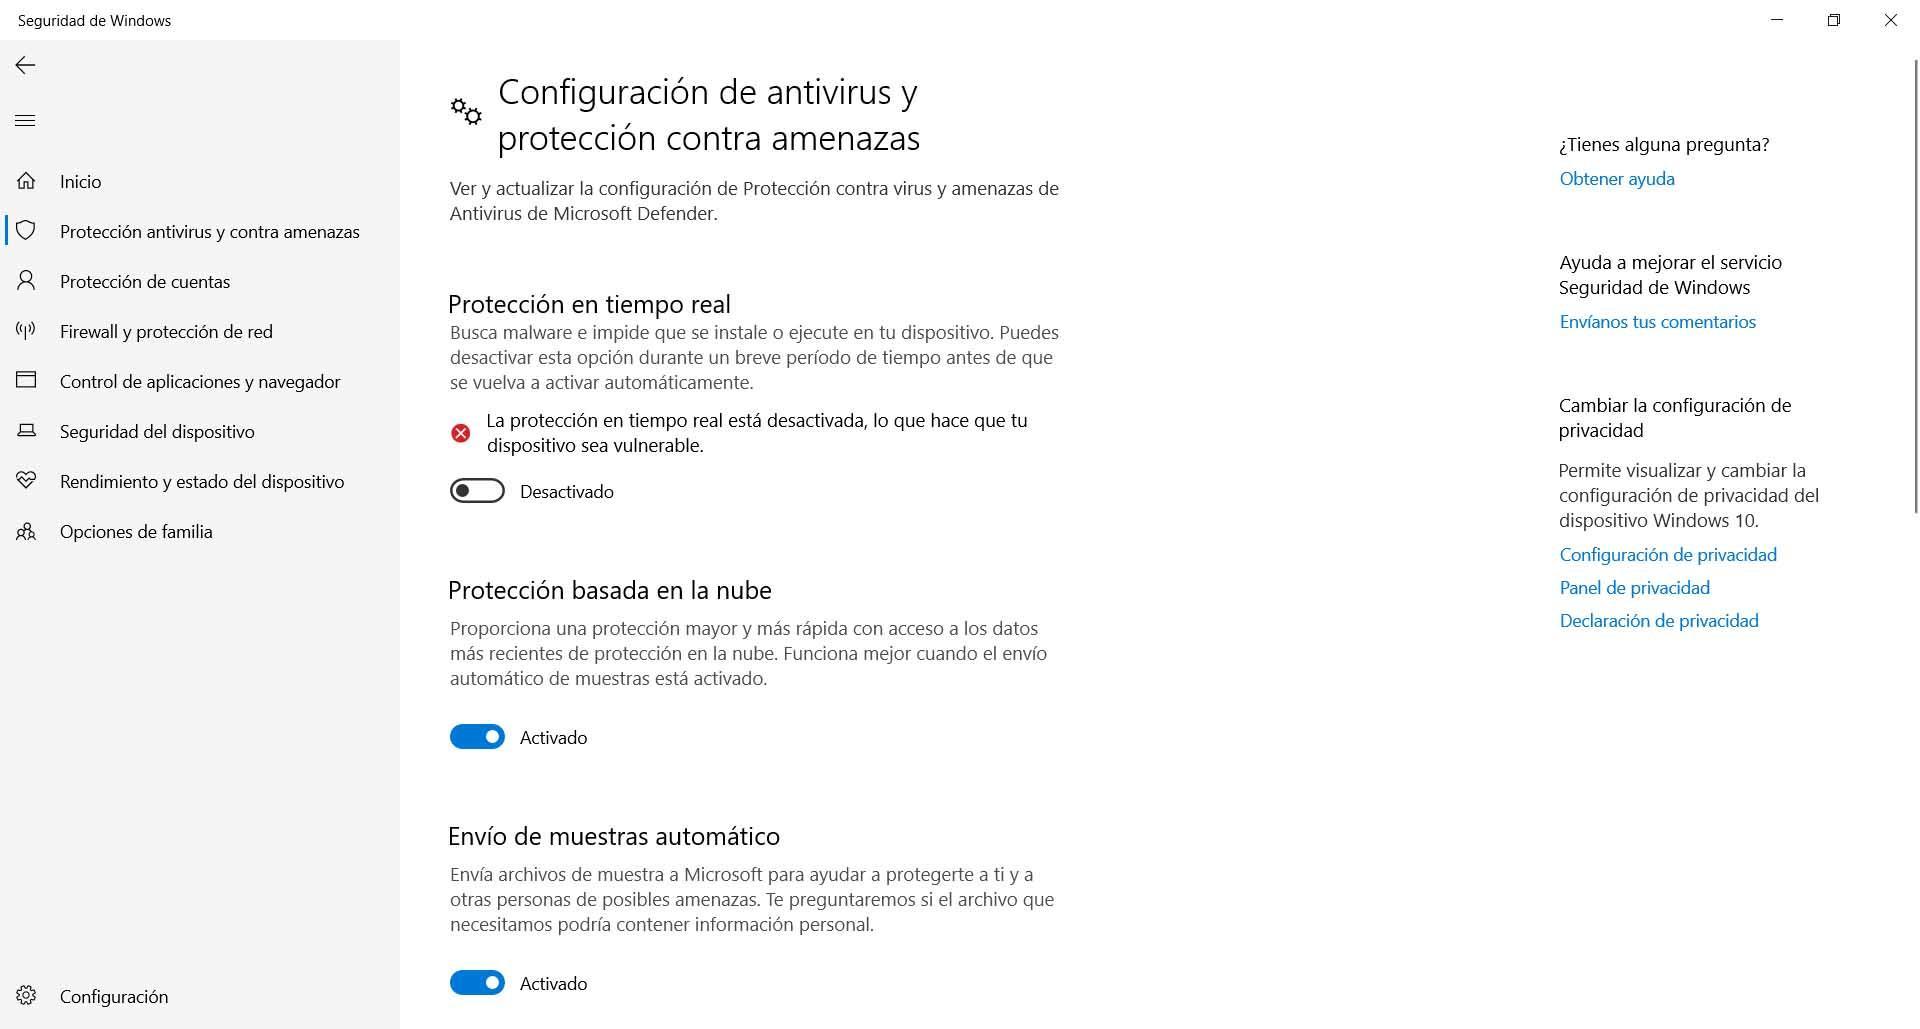 Restart Windows Defender to avoid error 0x800700